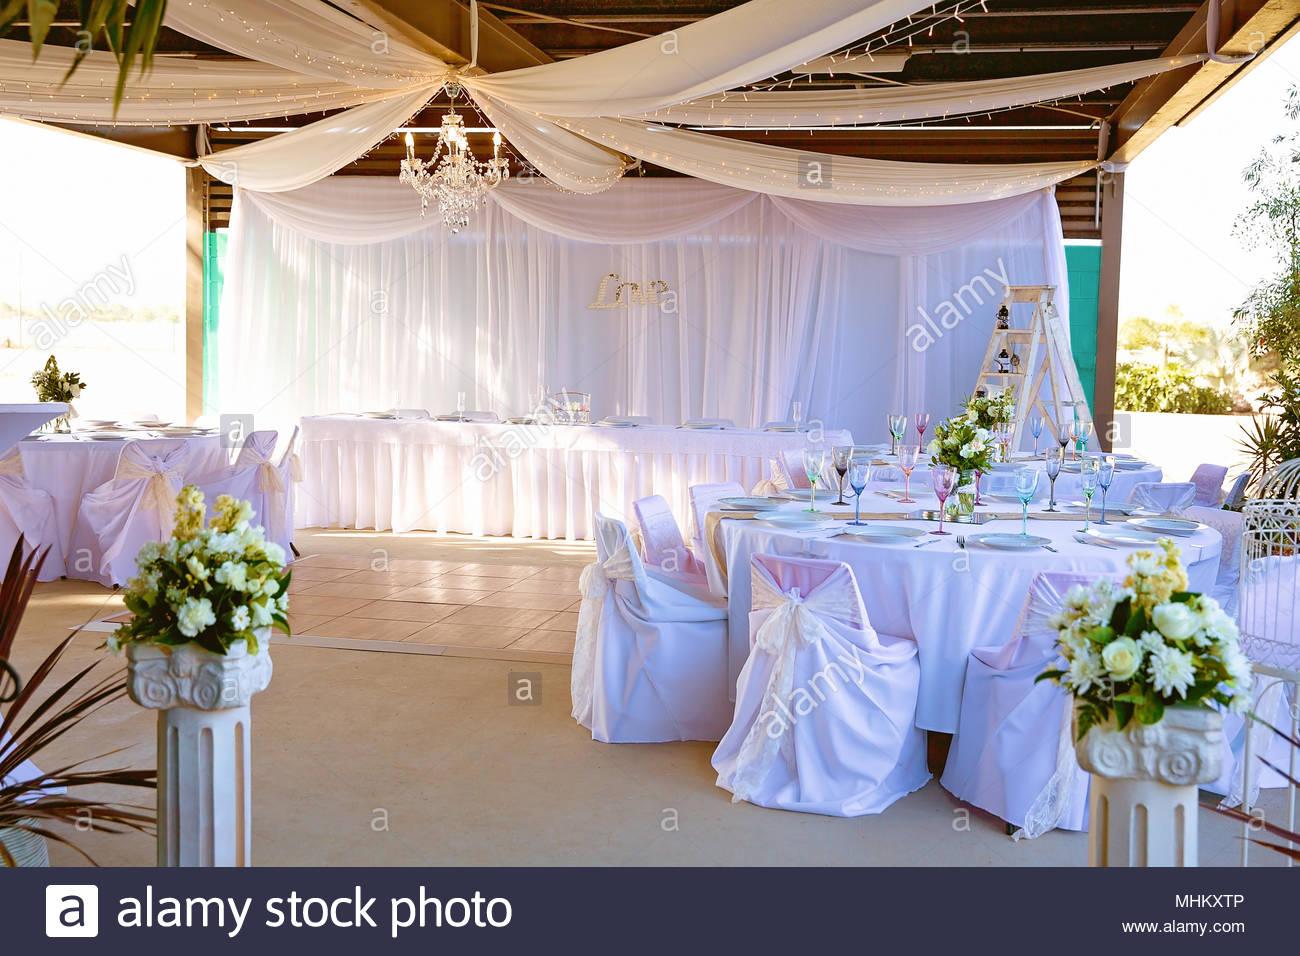 Outdoor Wedding Reception Venue Set Up Stock Photo 182990998 Alamy